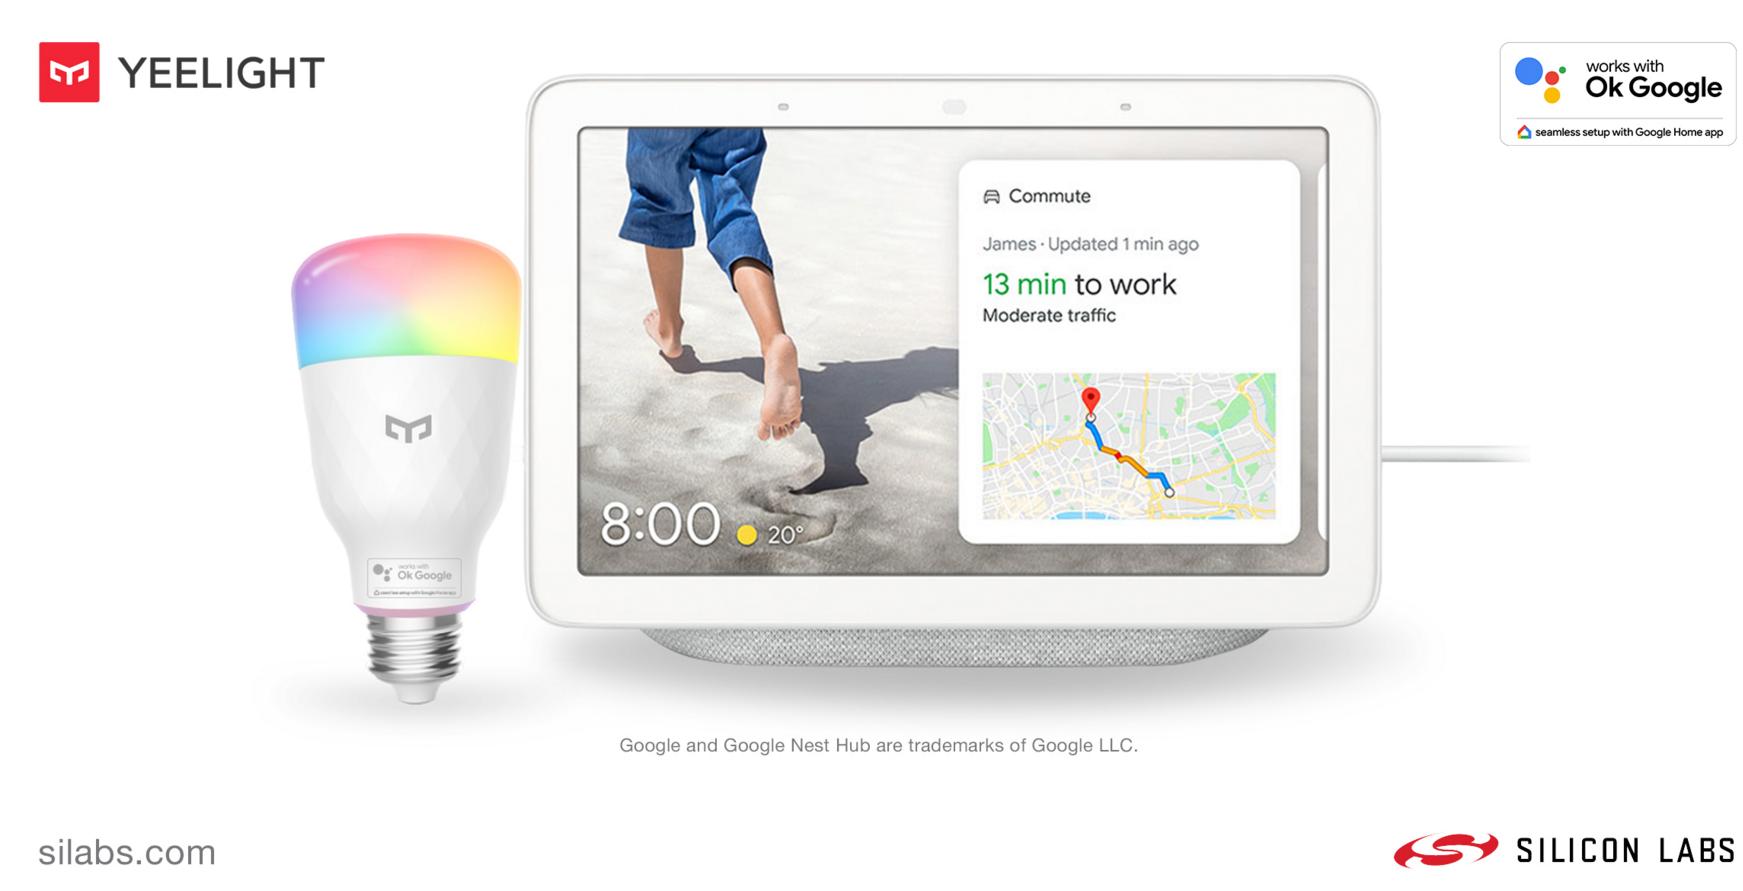 Silicon Labs联手Yeelight推出智能LED灯泡,实现更可靠无线连接